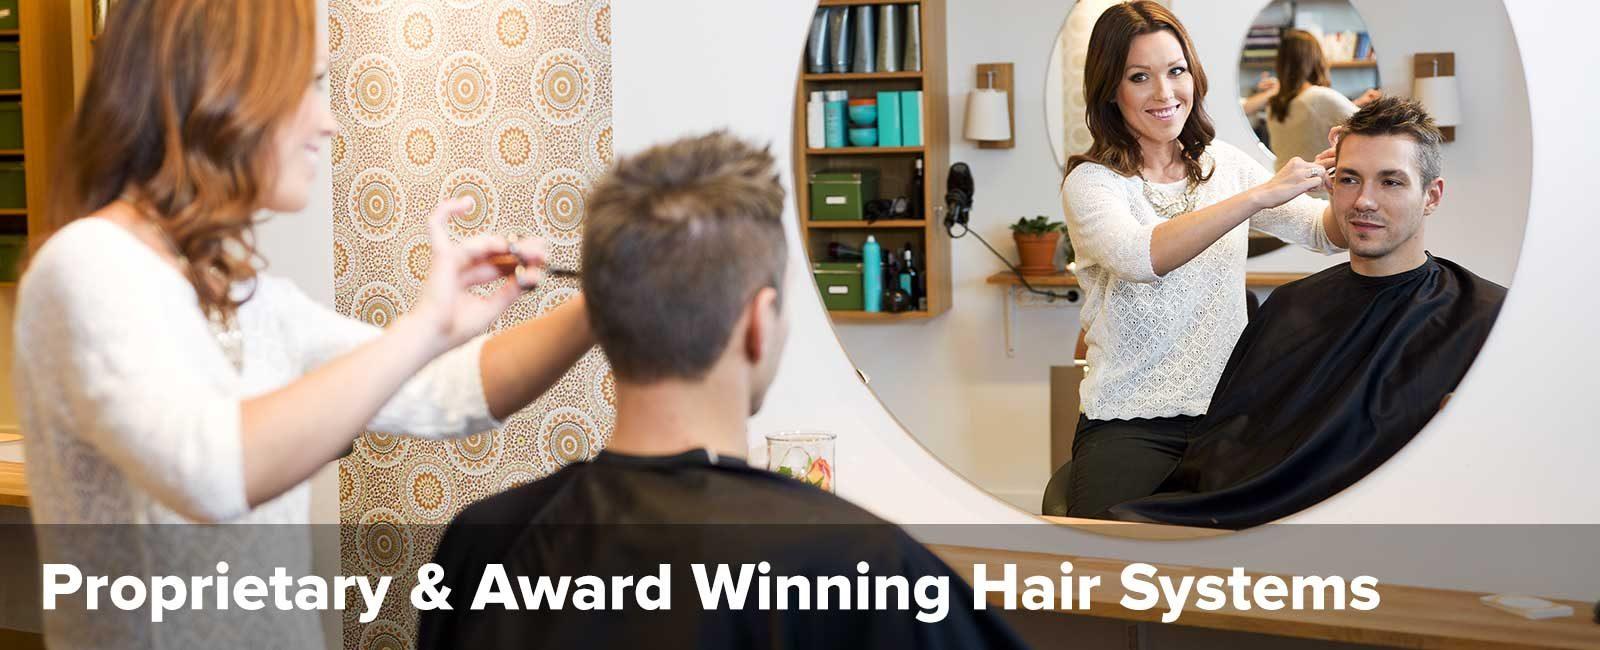 Award Winning Hair Systems